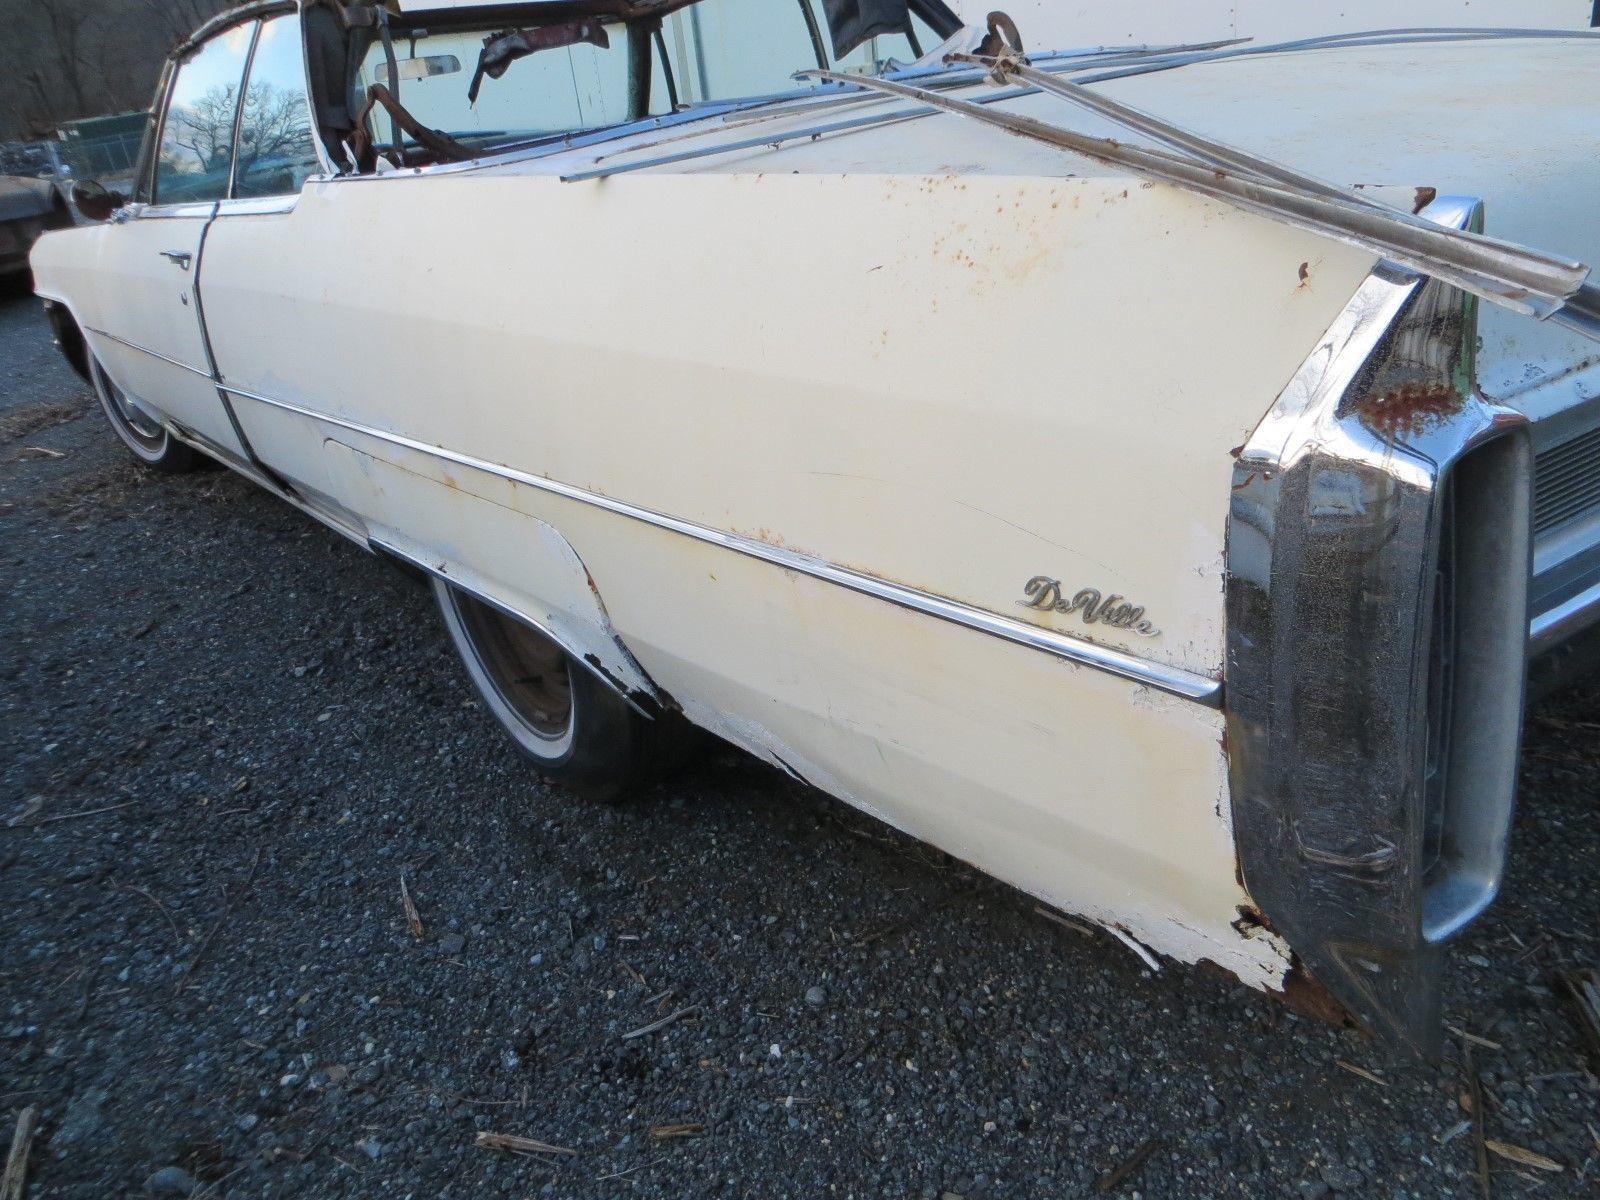 eBay: 1965 Cadillac DeVille 1965 Cadillac DeVille Convertible white